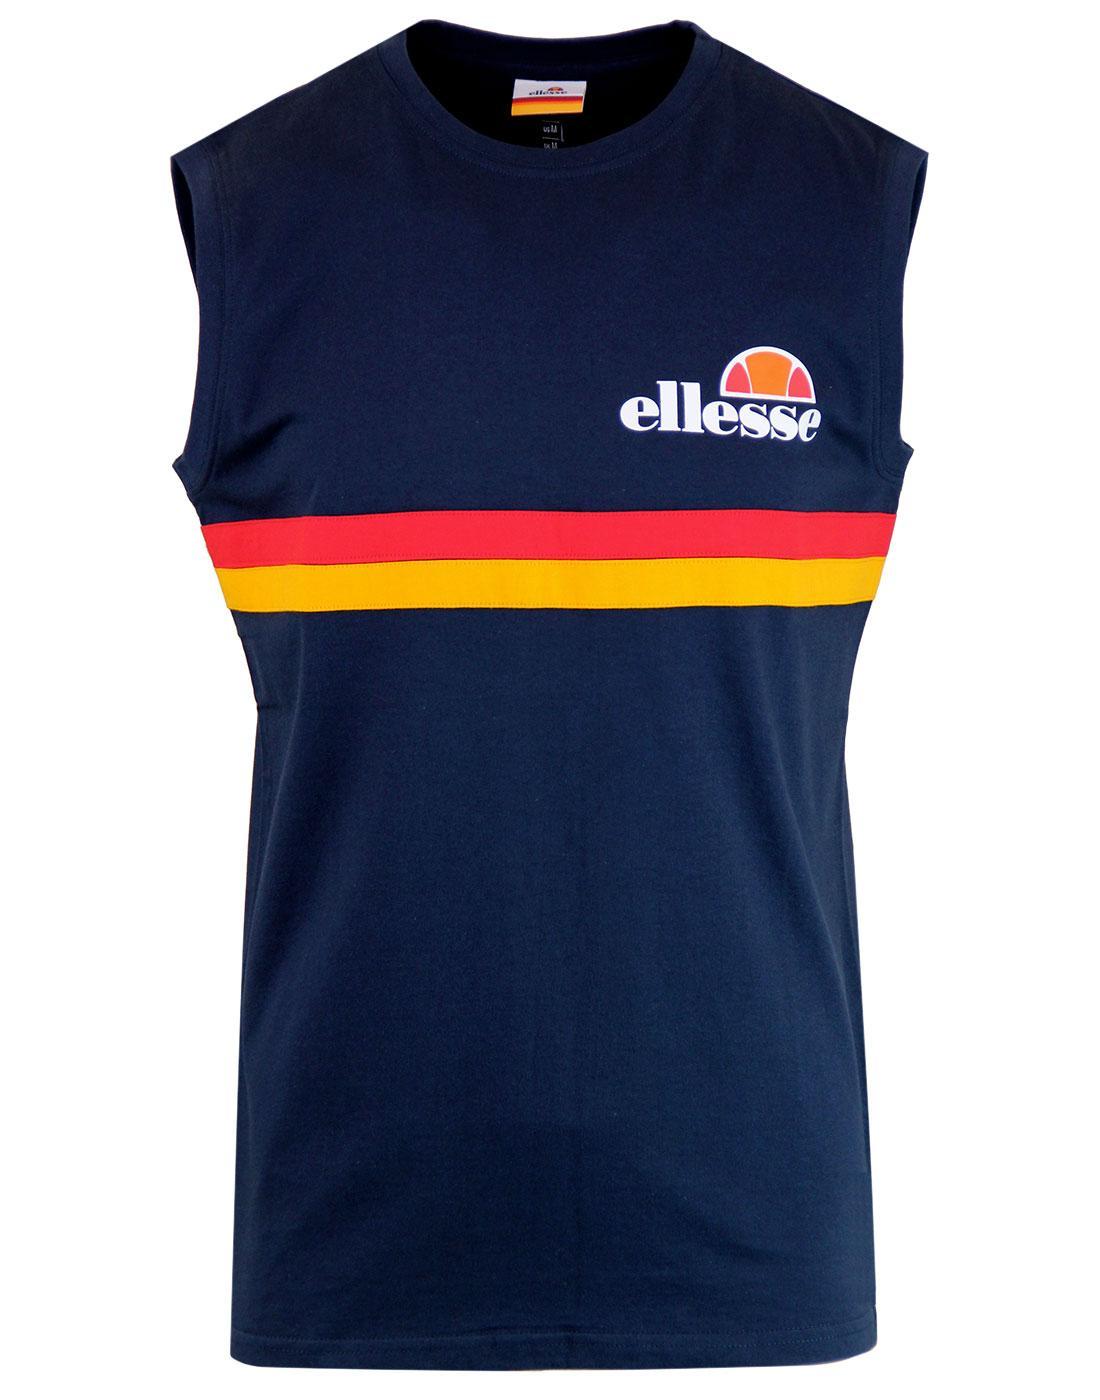 Aversa ELLESSE Men's Retro 1980s Chest Stripe Vest